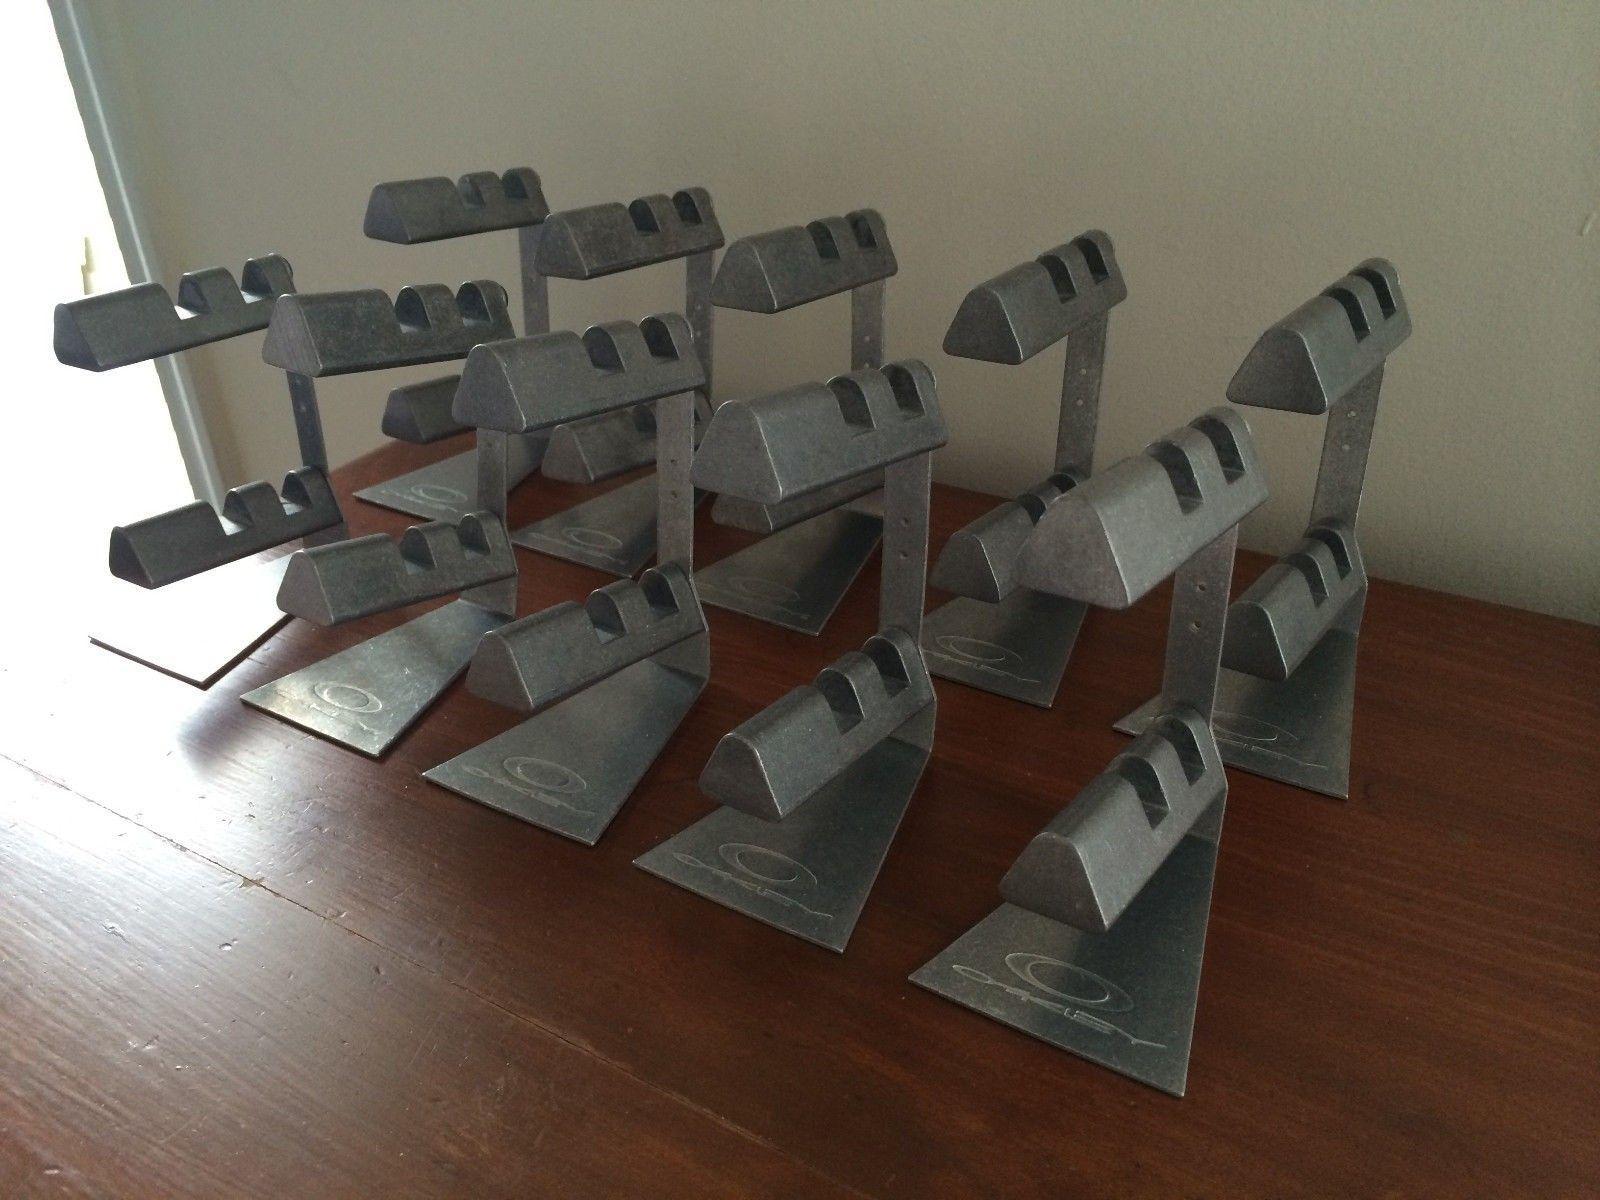 10x 2 Tier X-metal Display Stands $155 Or Trade - 12.JPG